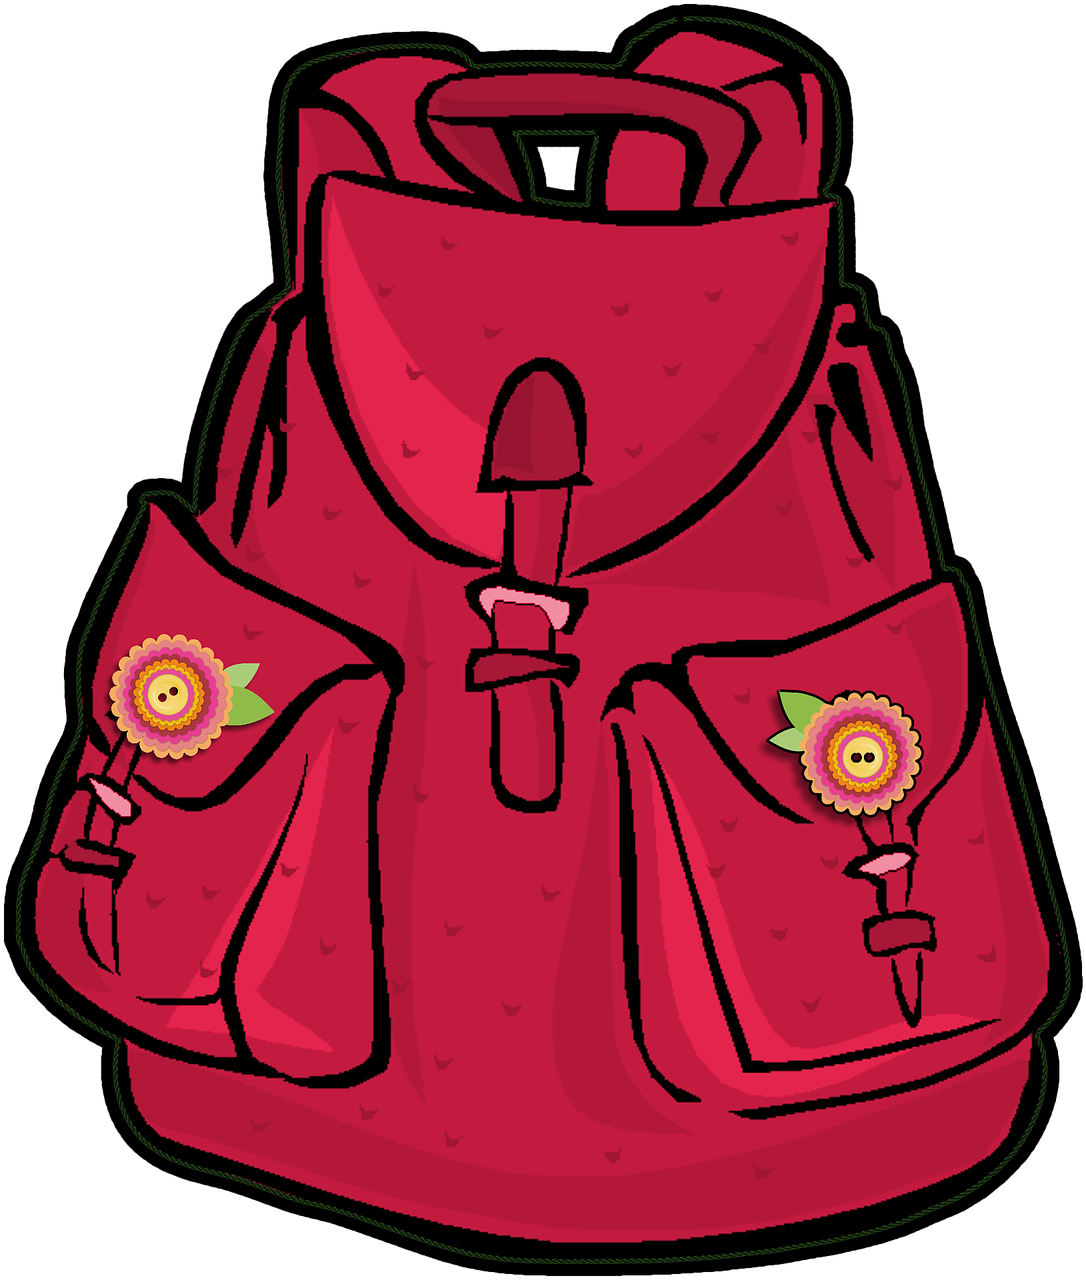 Europe clipart travel europe. Pink backpack girl school